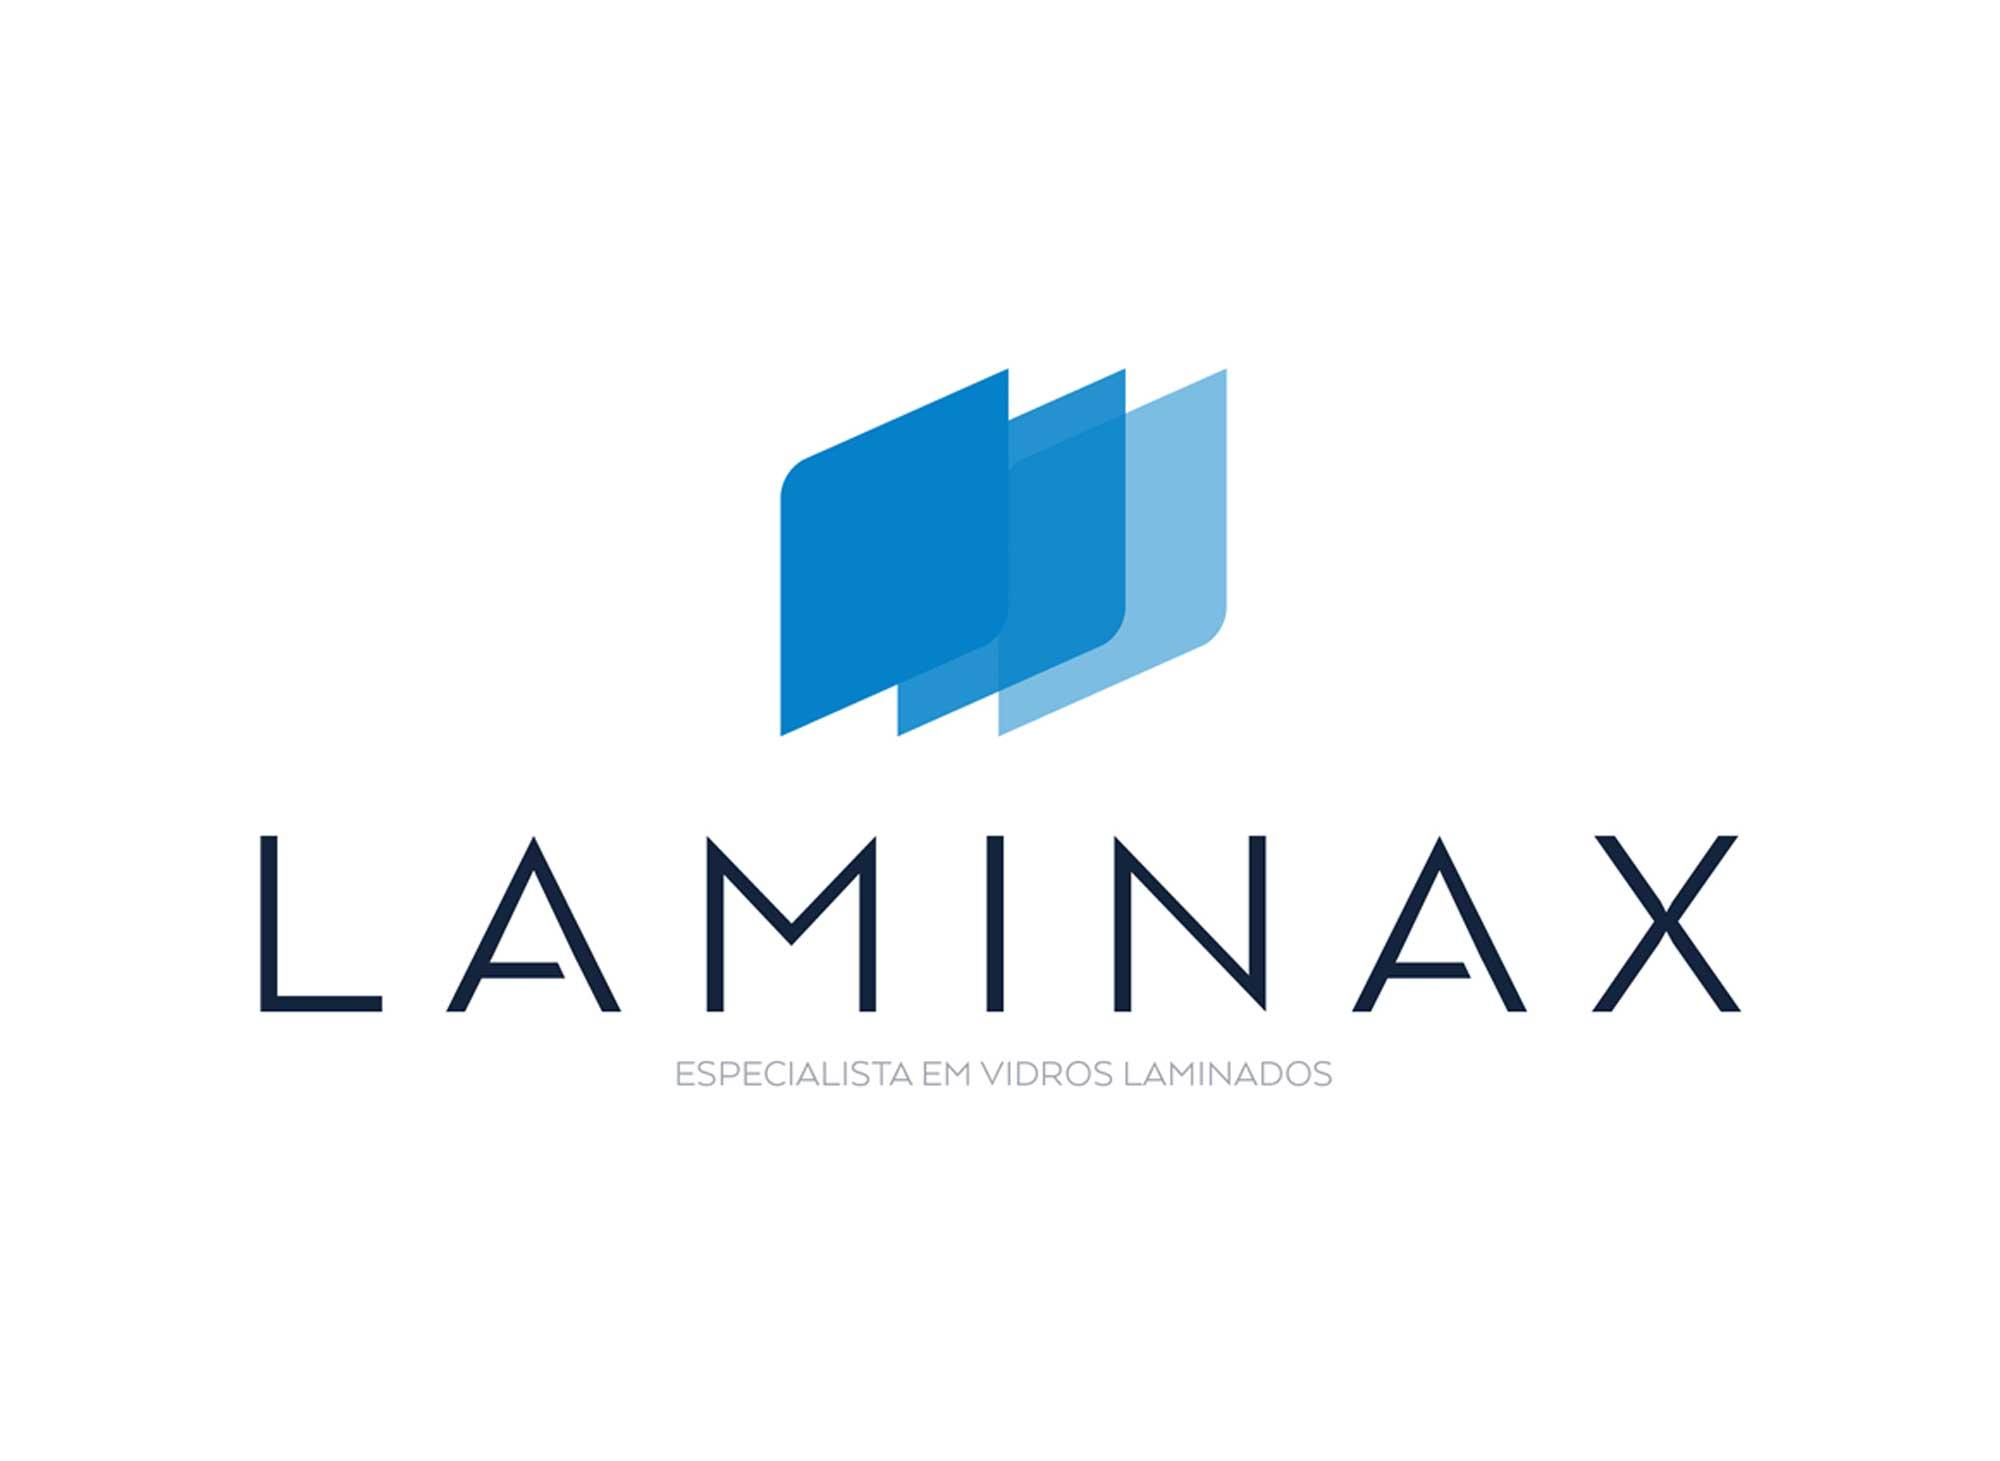 laminax-vidros-laminados-cliente-agencia-diretriz-digital-marketing-fortaleza